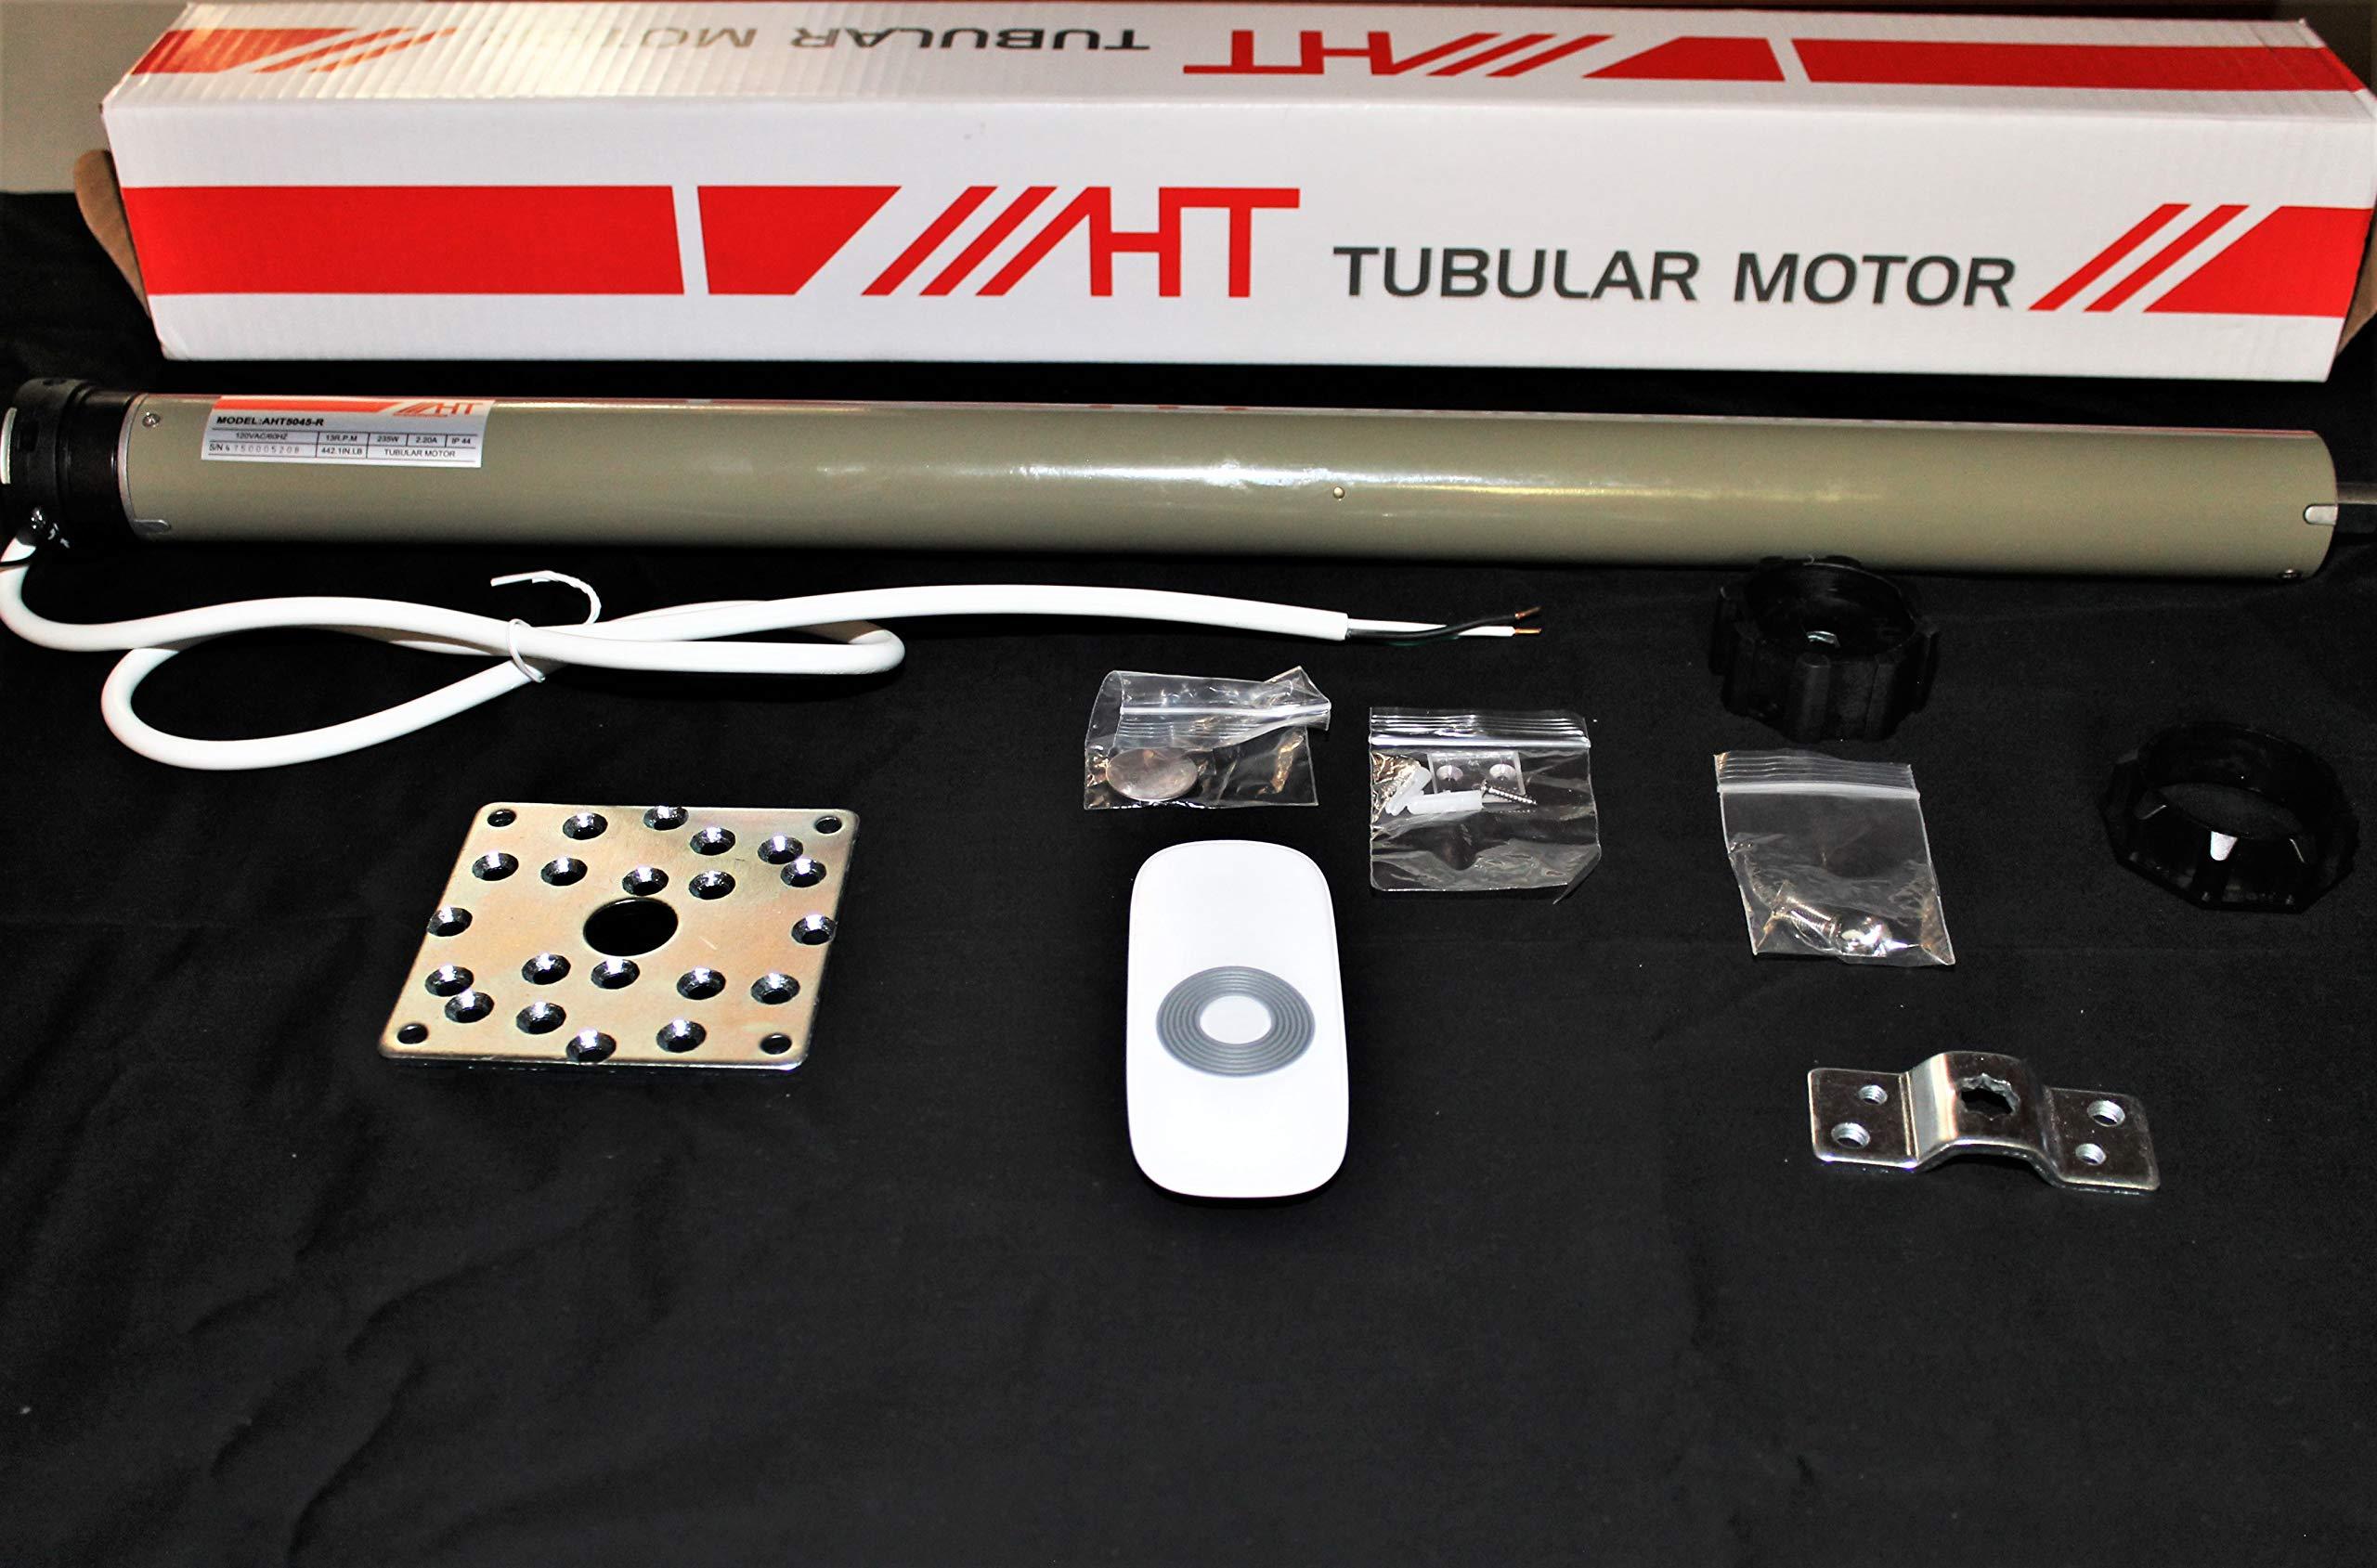 AHT Tubular Motor 50nm with Internal Receiver